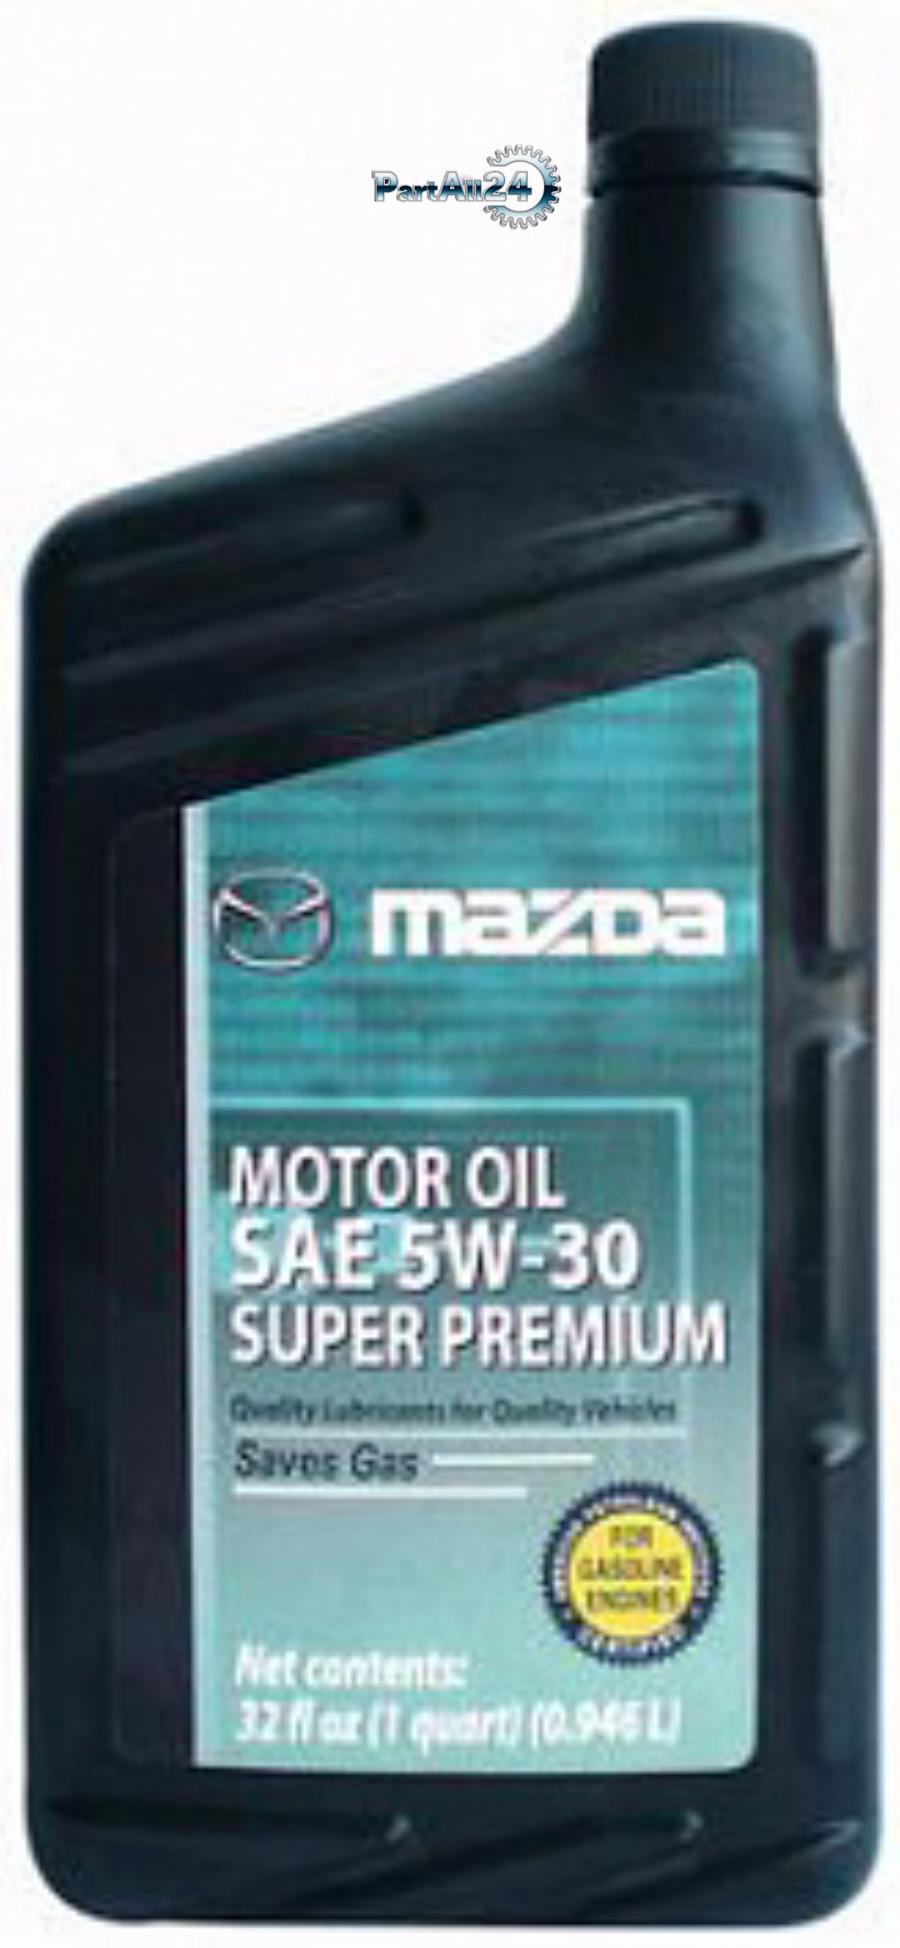 Масло моторное полусинтетическое Super Premium 5W-30, 0,946л